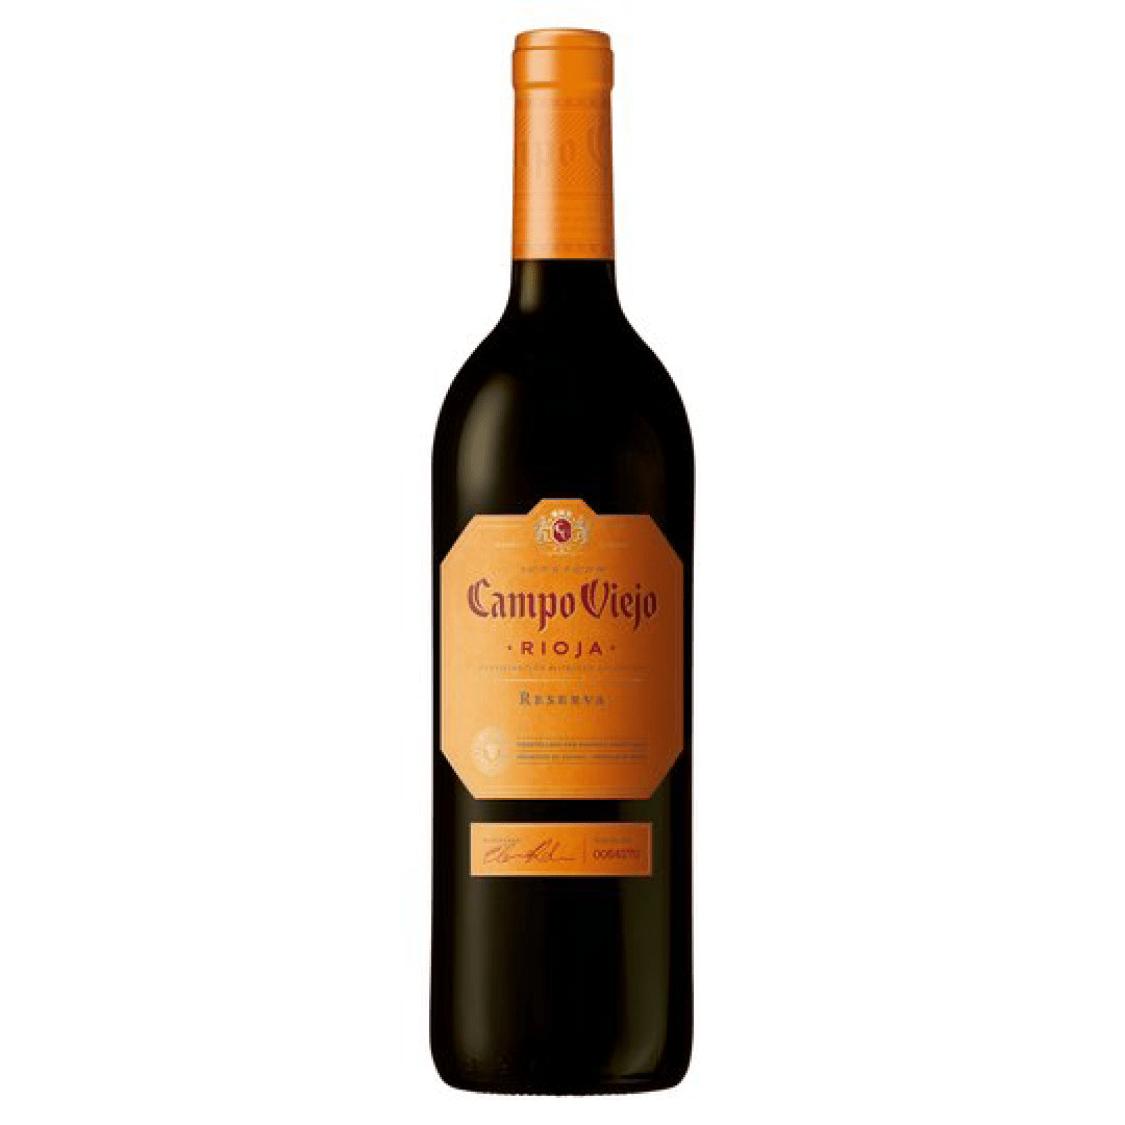 Campo Viejo Rioja Reserva - Shop The Bar - Female Original